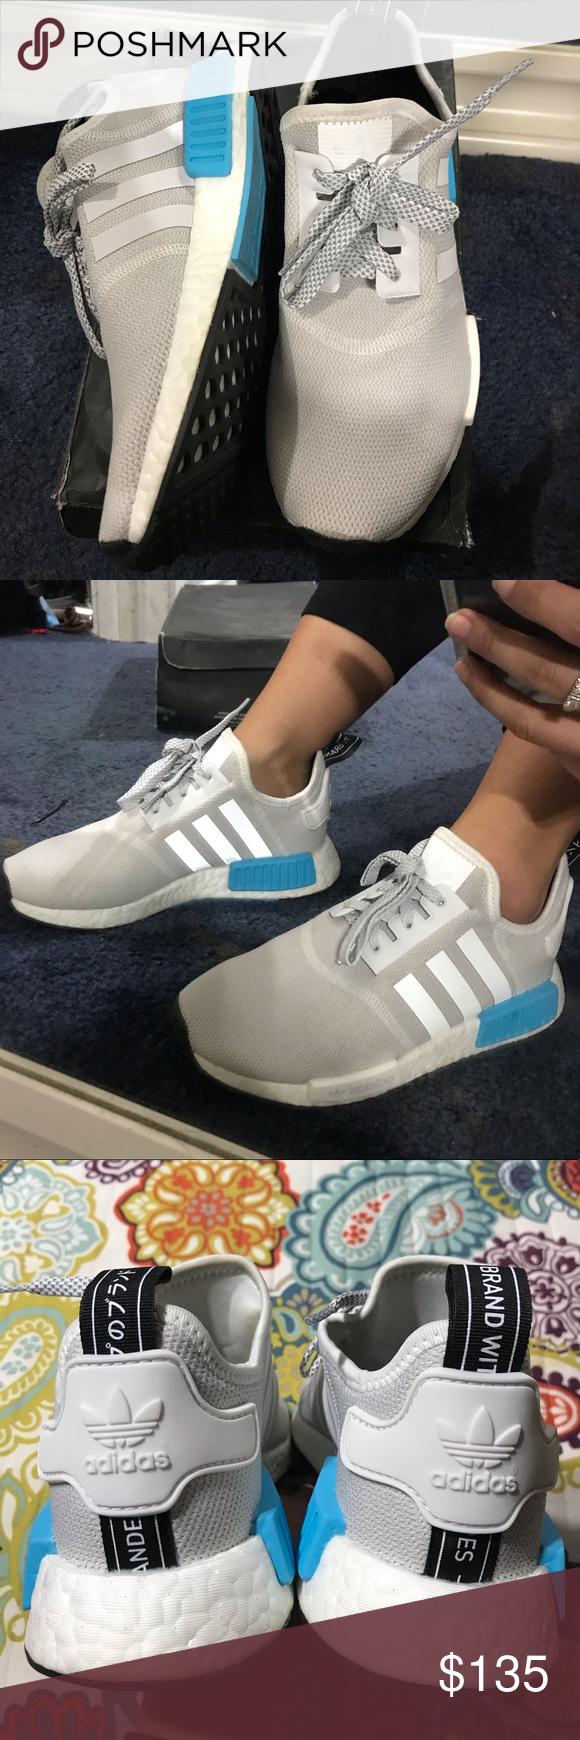 6d2e16f99 Adidas White cyan NMD Size 4 Youth (but fit like size 5 womens) Adidas